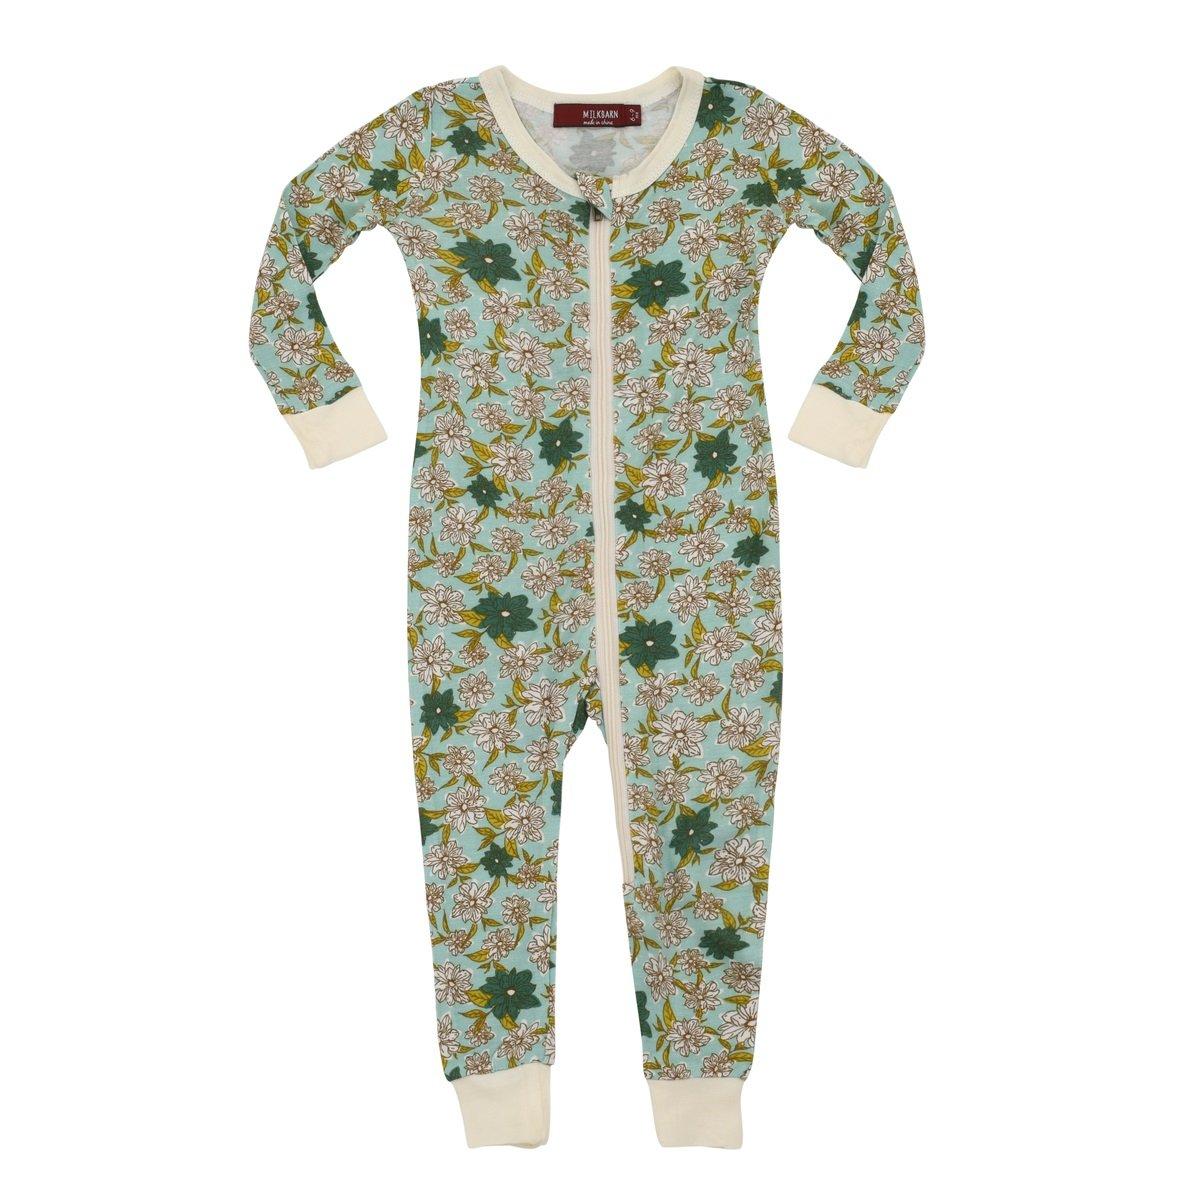 MilkBarn Bamboo Zipper Pajama - Blue Floral (6-9 Month) by MilkBarn